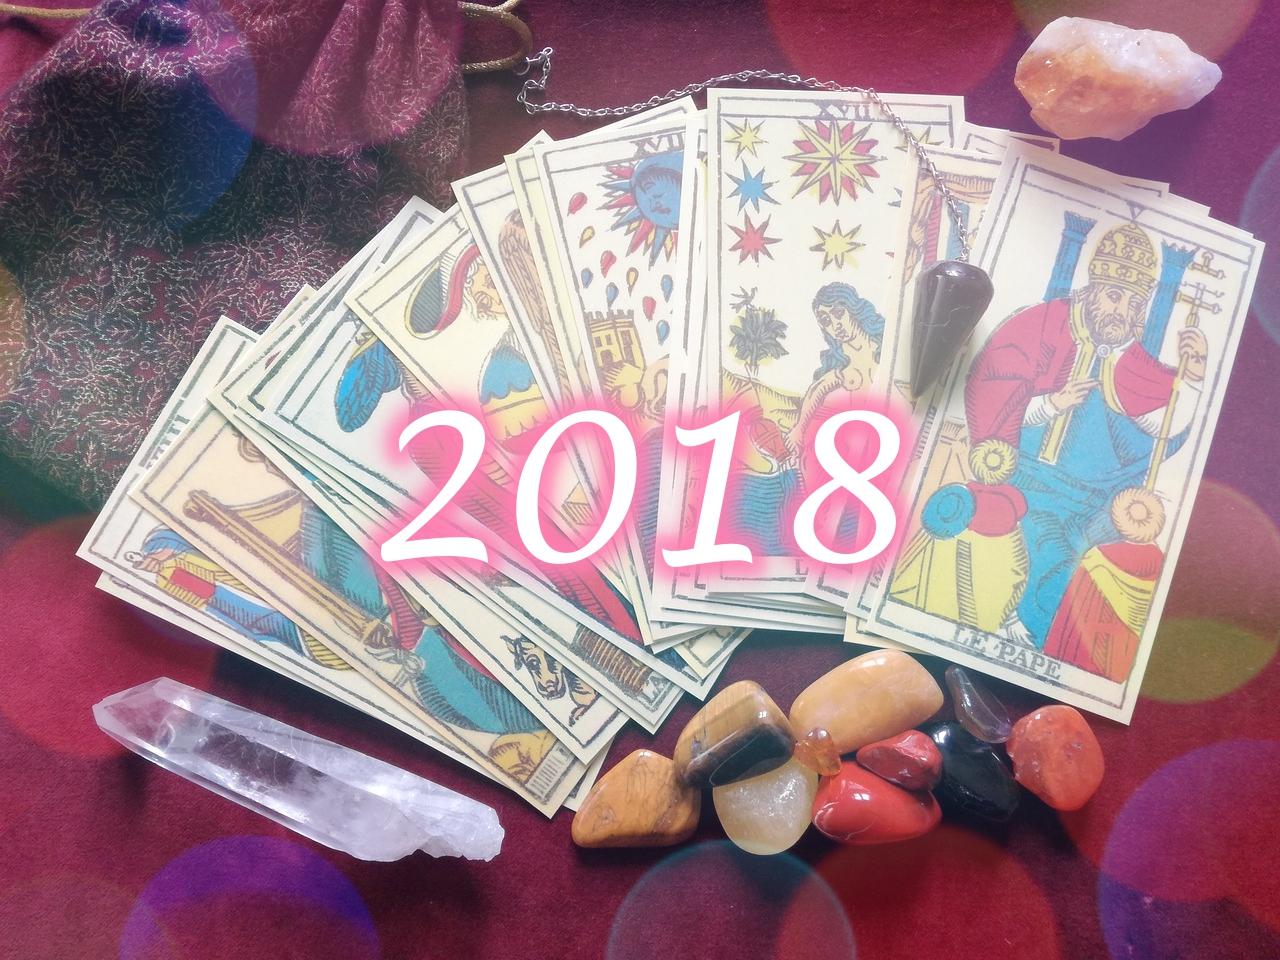 2019 Tarot: Discover your annual Tarot card predictions